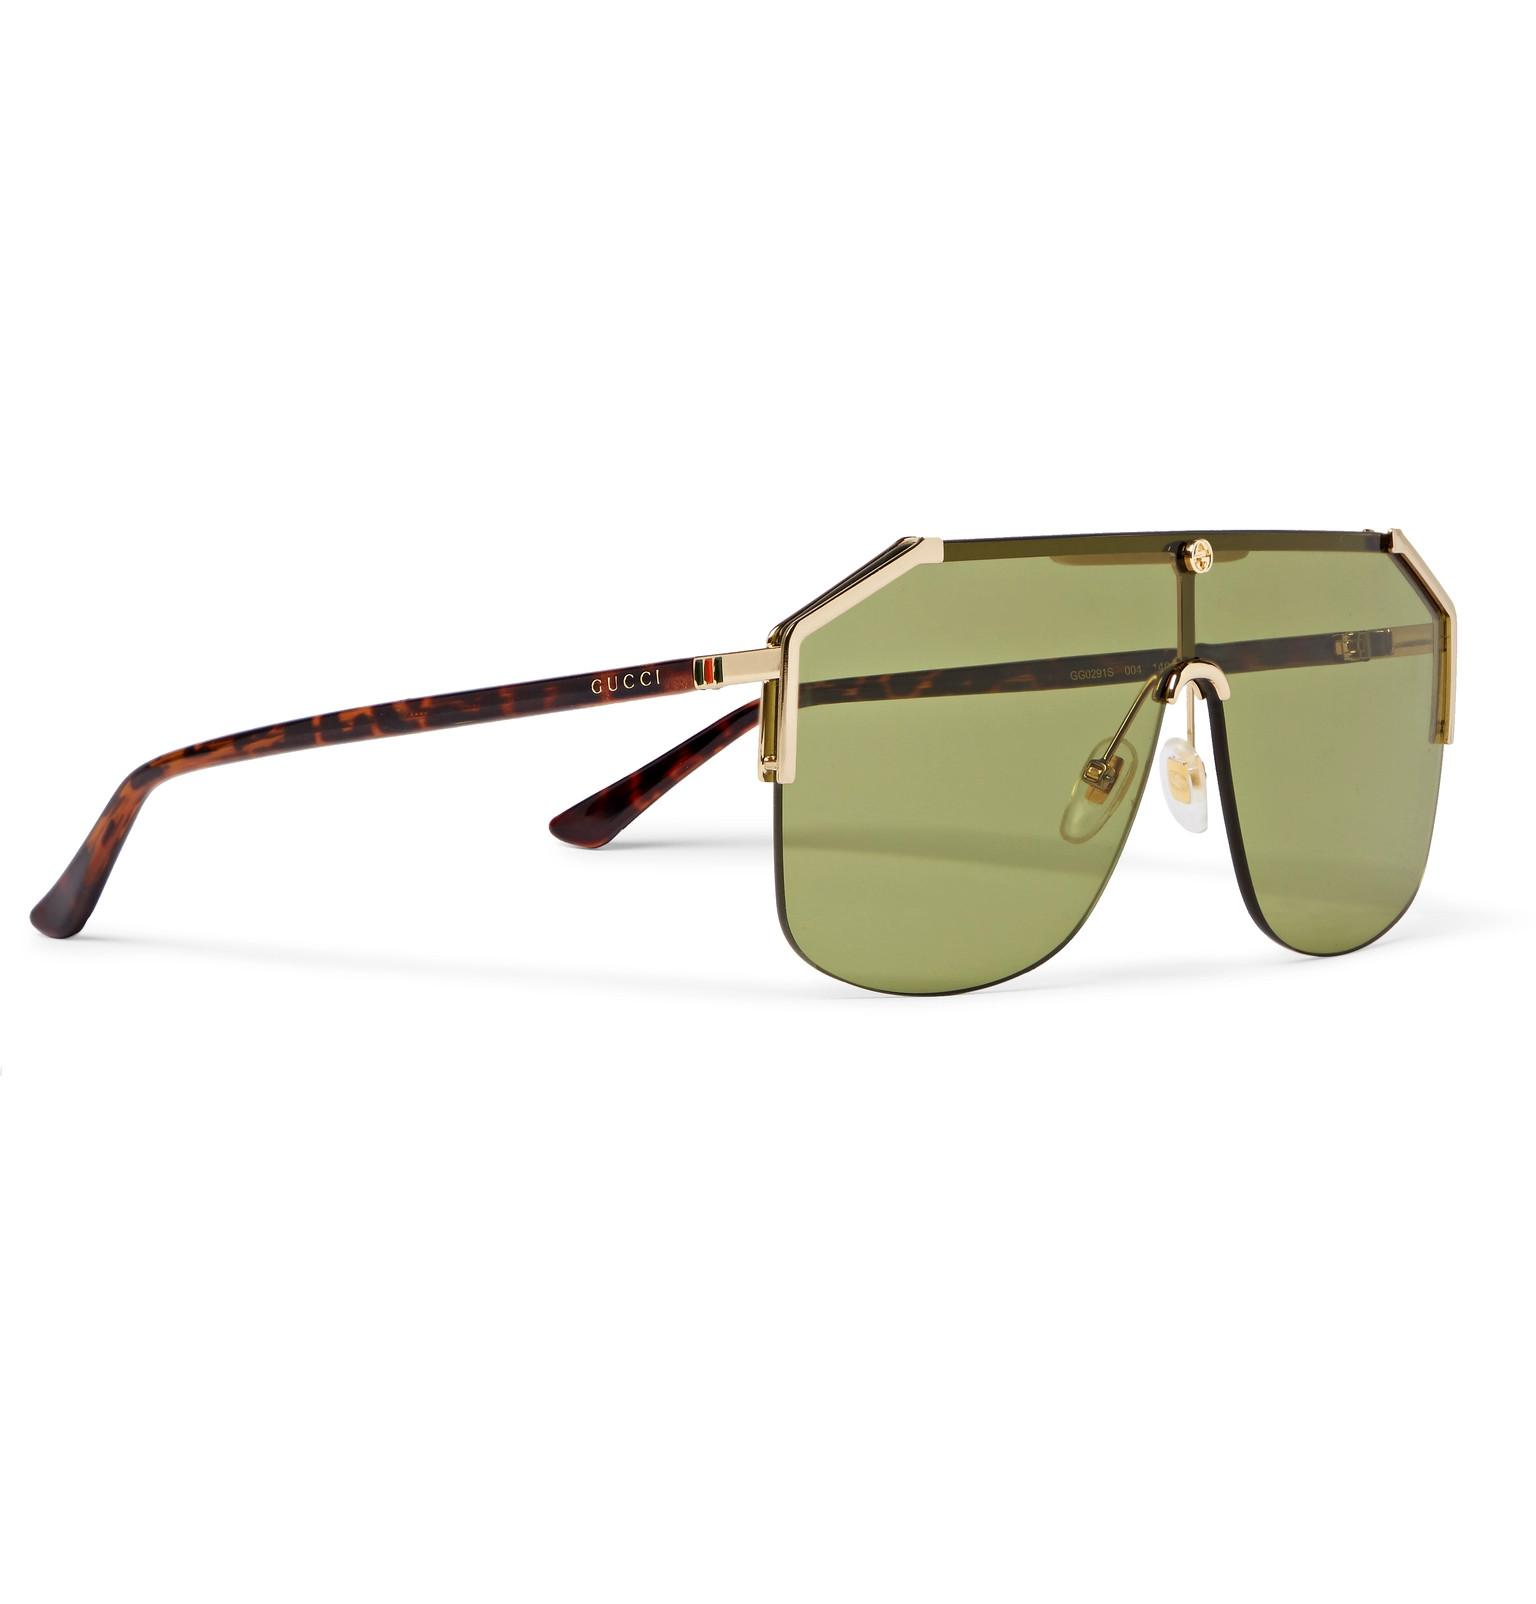 6be751c75f1a Gucci Endura Oversized Aviator-style Gold-tone And Tortoiseshell ...